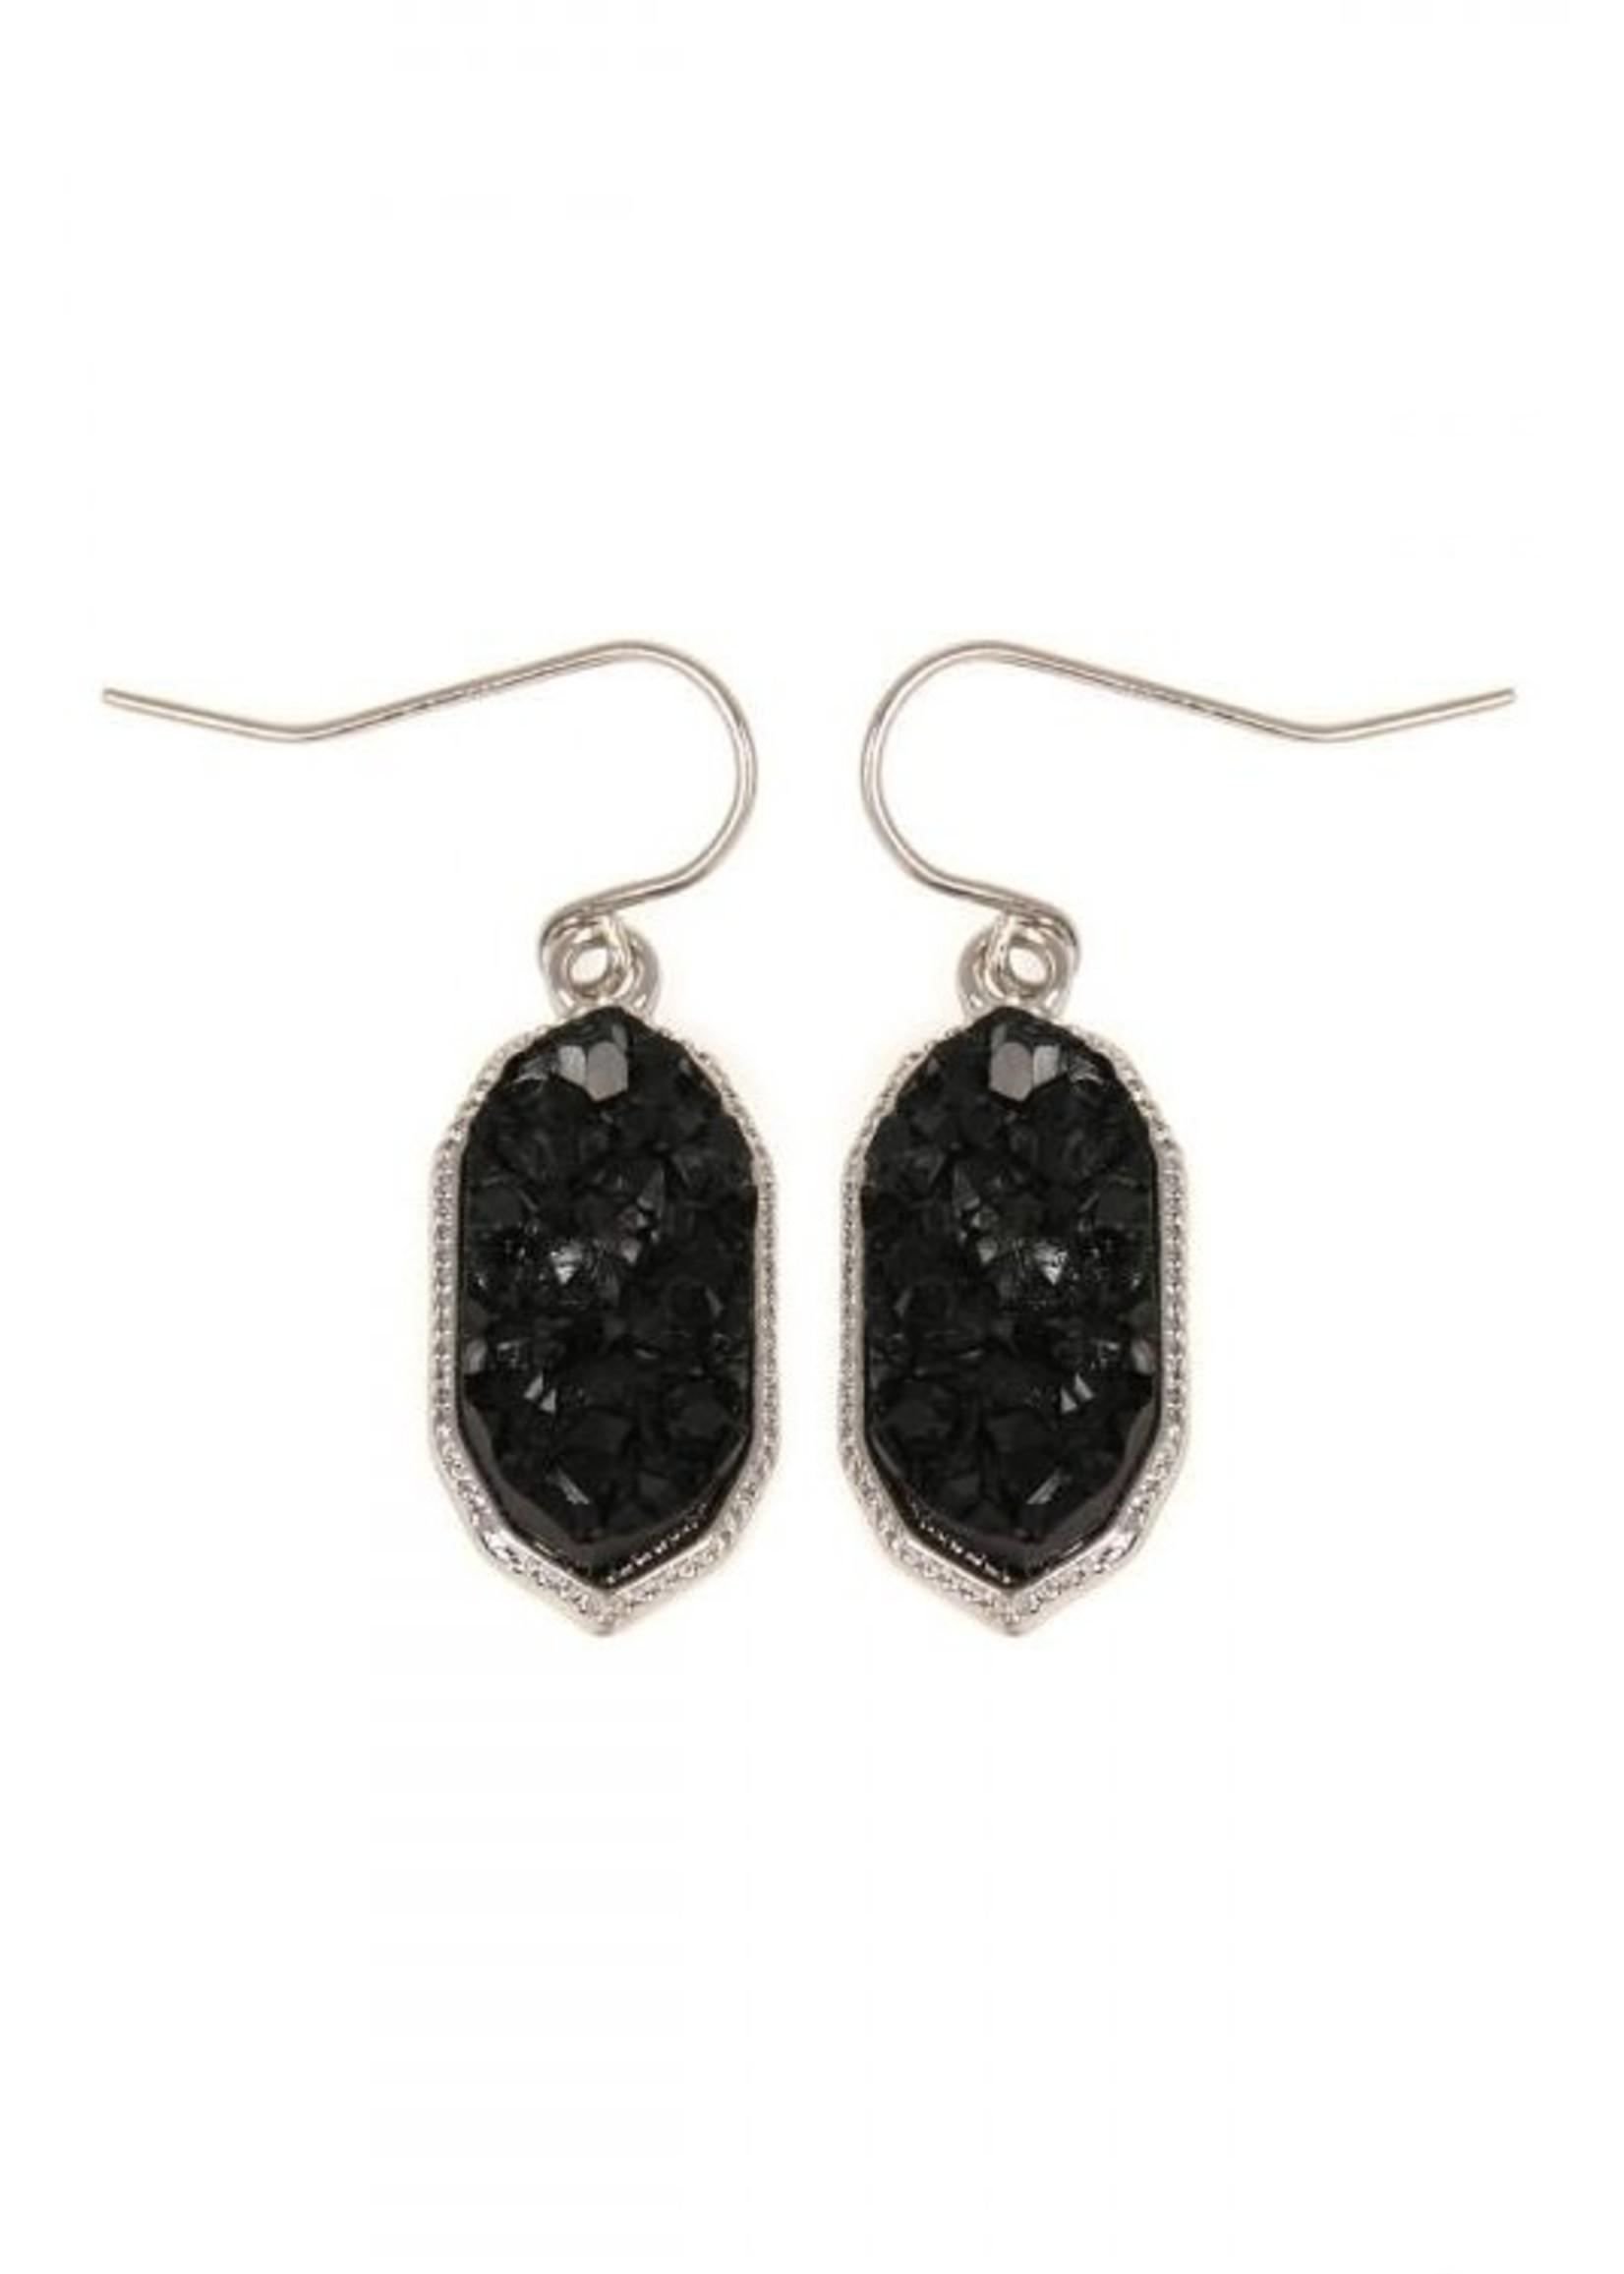 Apparel Candy Rhodium Black Druzy Drop Earrings